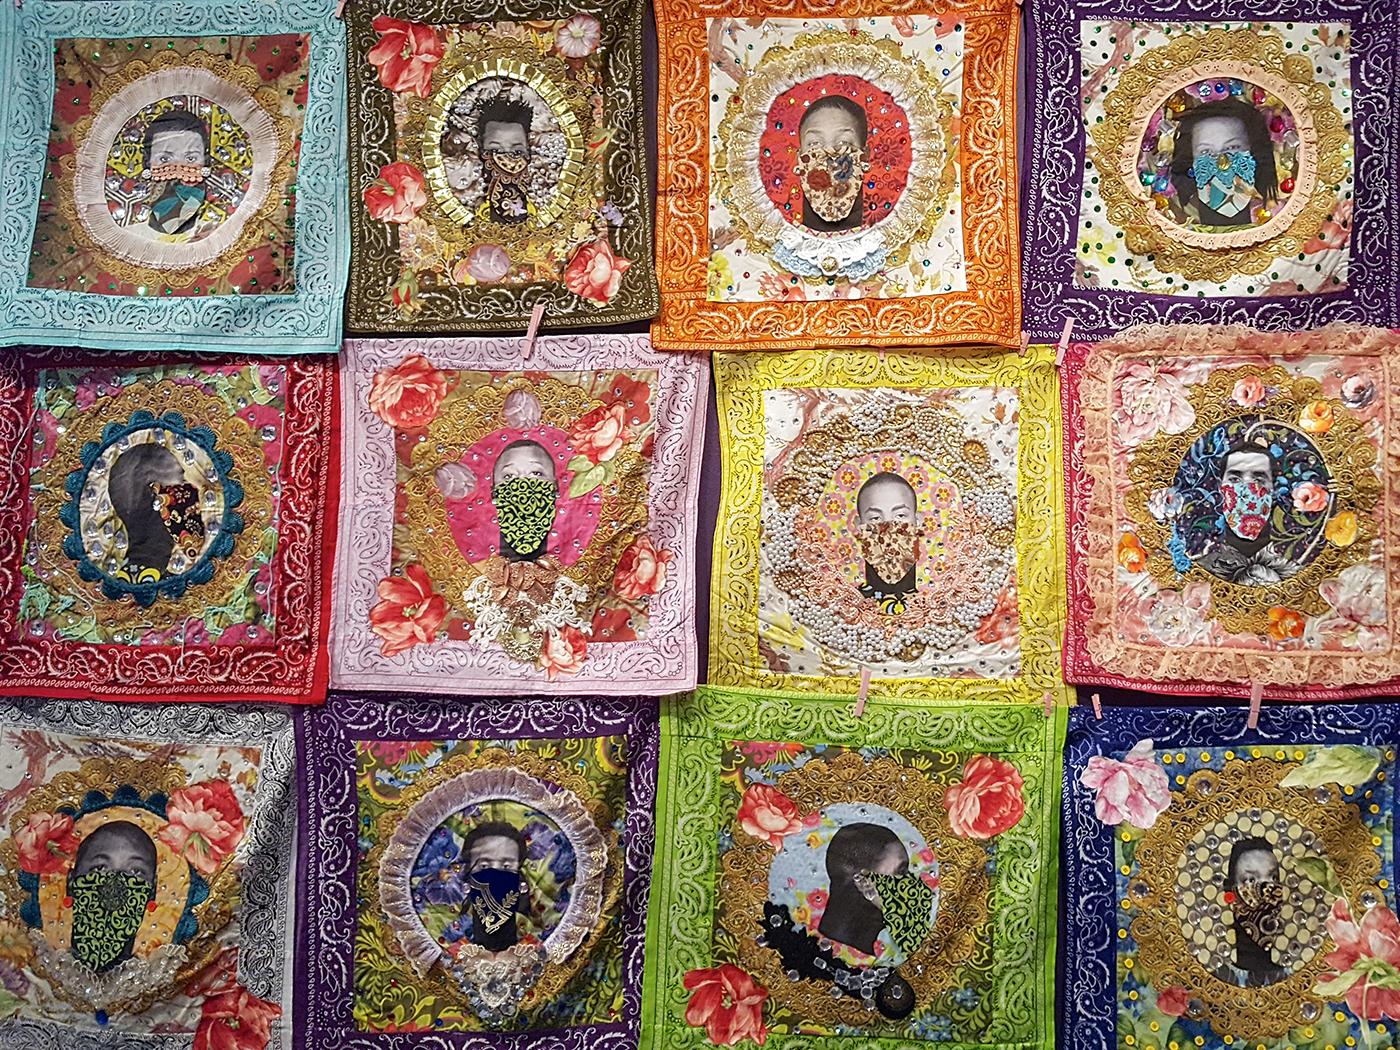 Ebony Patterson, Jamaica Massacre, African American Art, Black Art, KINDR'D Magazine, KINDR'D, KOLUMN Magazine, KOLUMN